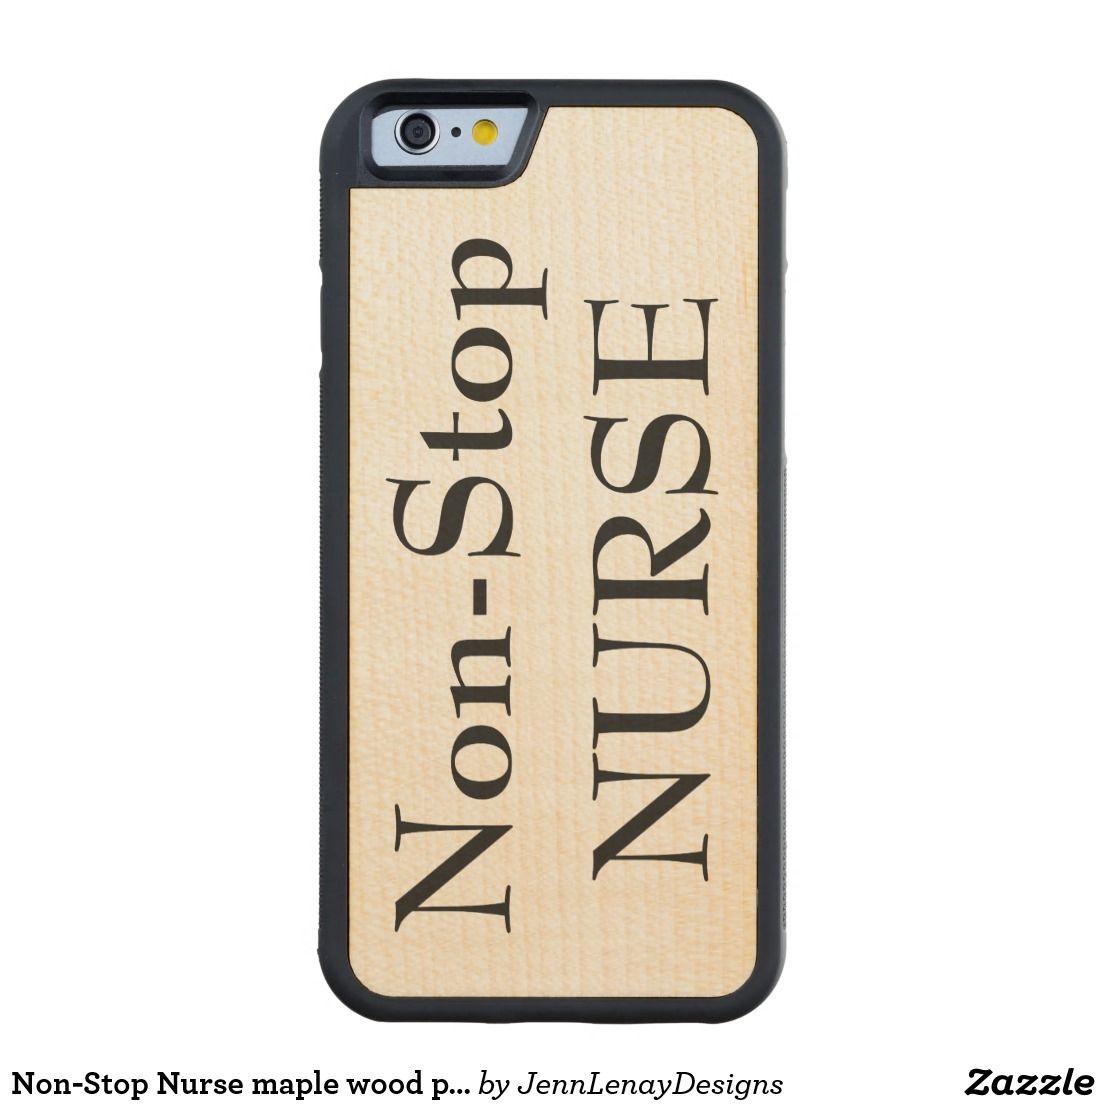 Non-Stop Nurse maple wood phone case #Nurse #Wood #Maple # ...